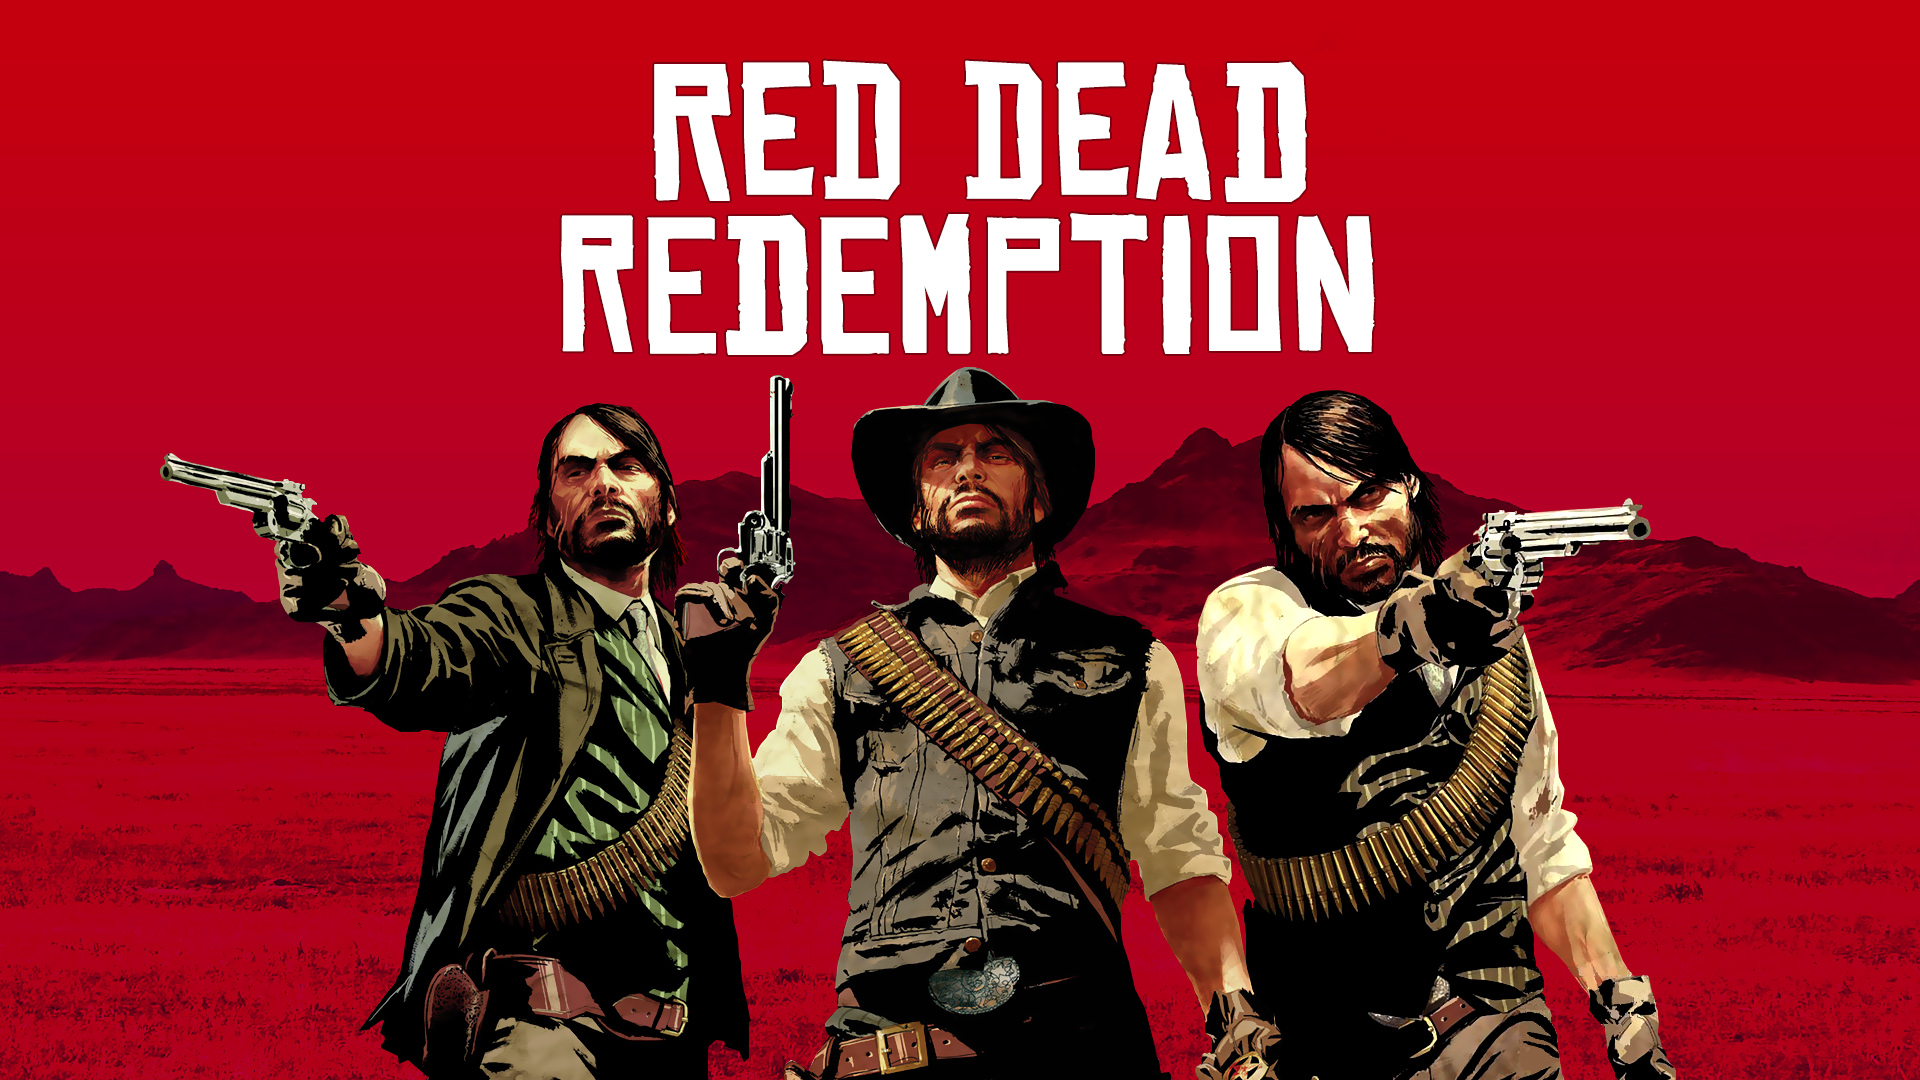 Red Dead Redemption Desktop Wallpaper By Barkerdnz On Deviantart